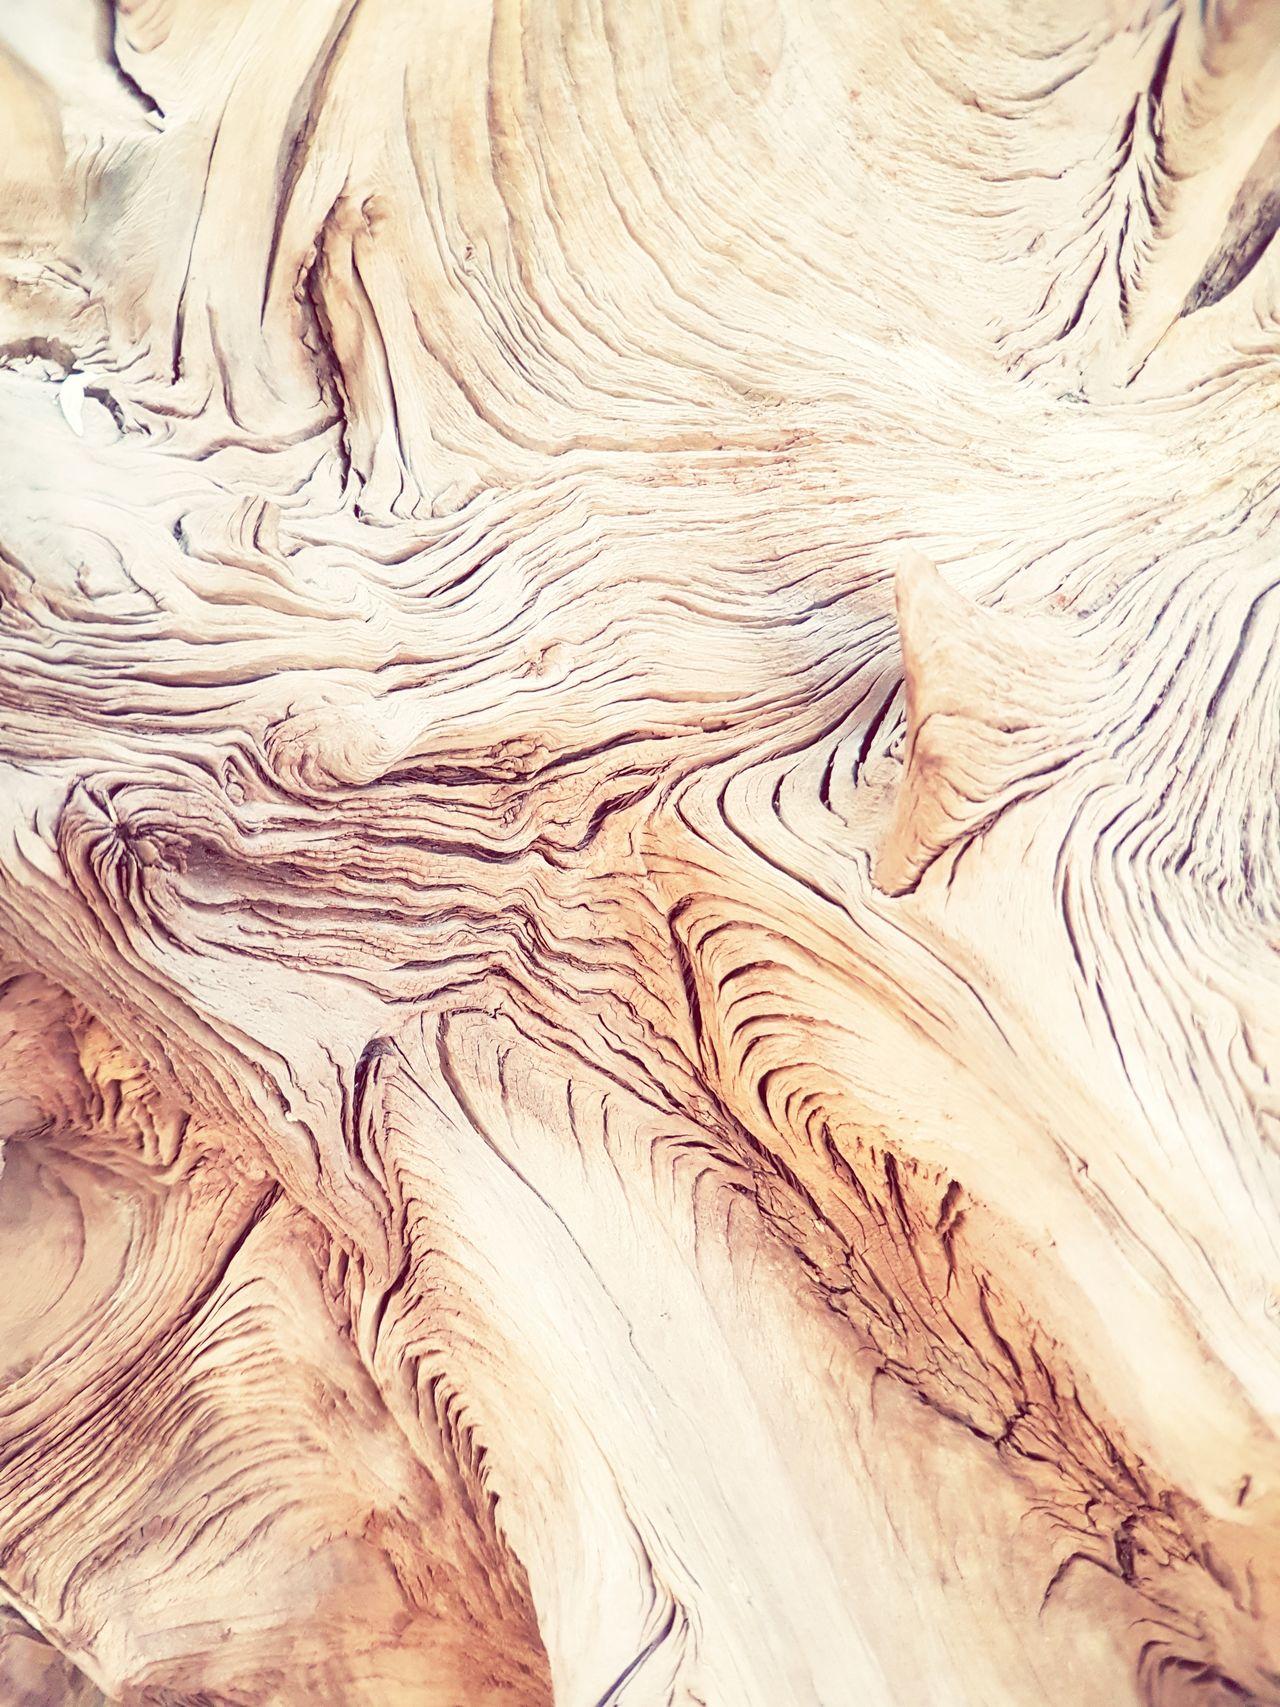 Pattern Textured  Wood Surface Wood Texture Wood Texture Material Wood Texture Background Wood Structure Old Tree Old Tree Stumps Tree_collection  Tree_collection  Tree Wood - Material Wood Cover Nature Textured  Backgrounds Tree_collection